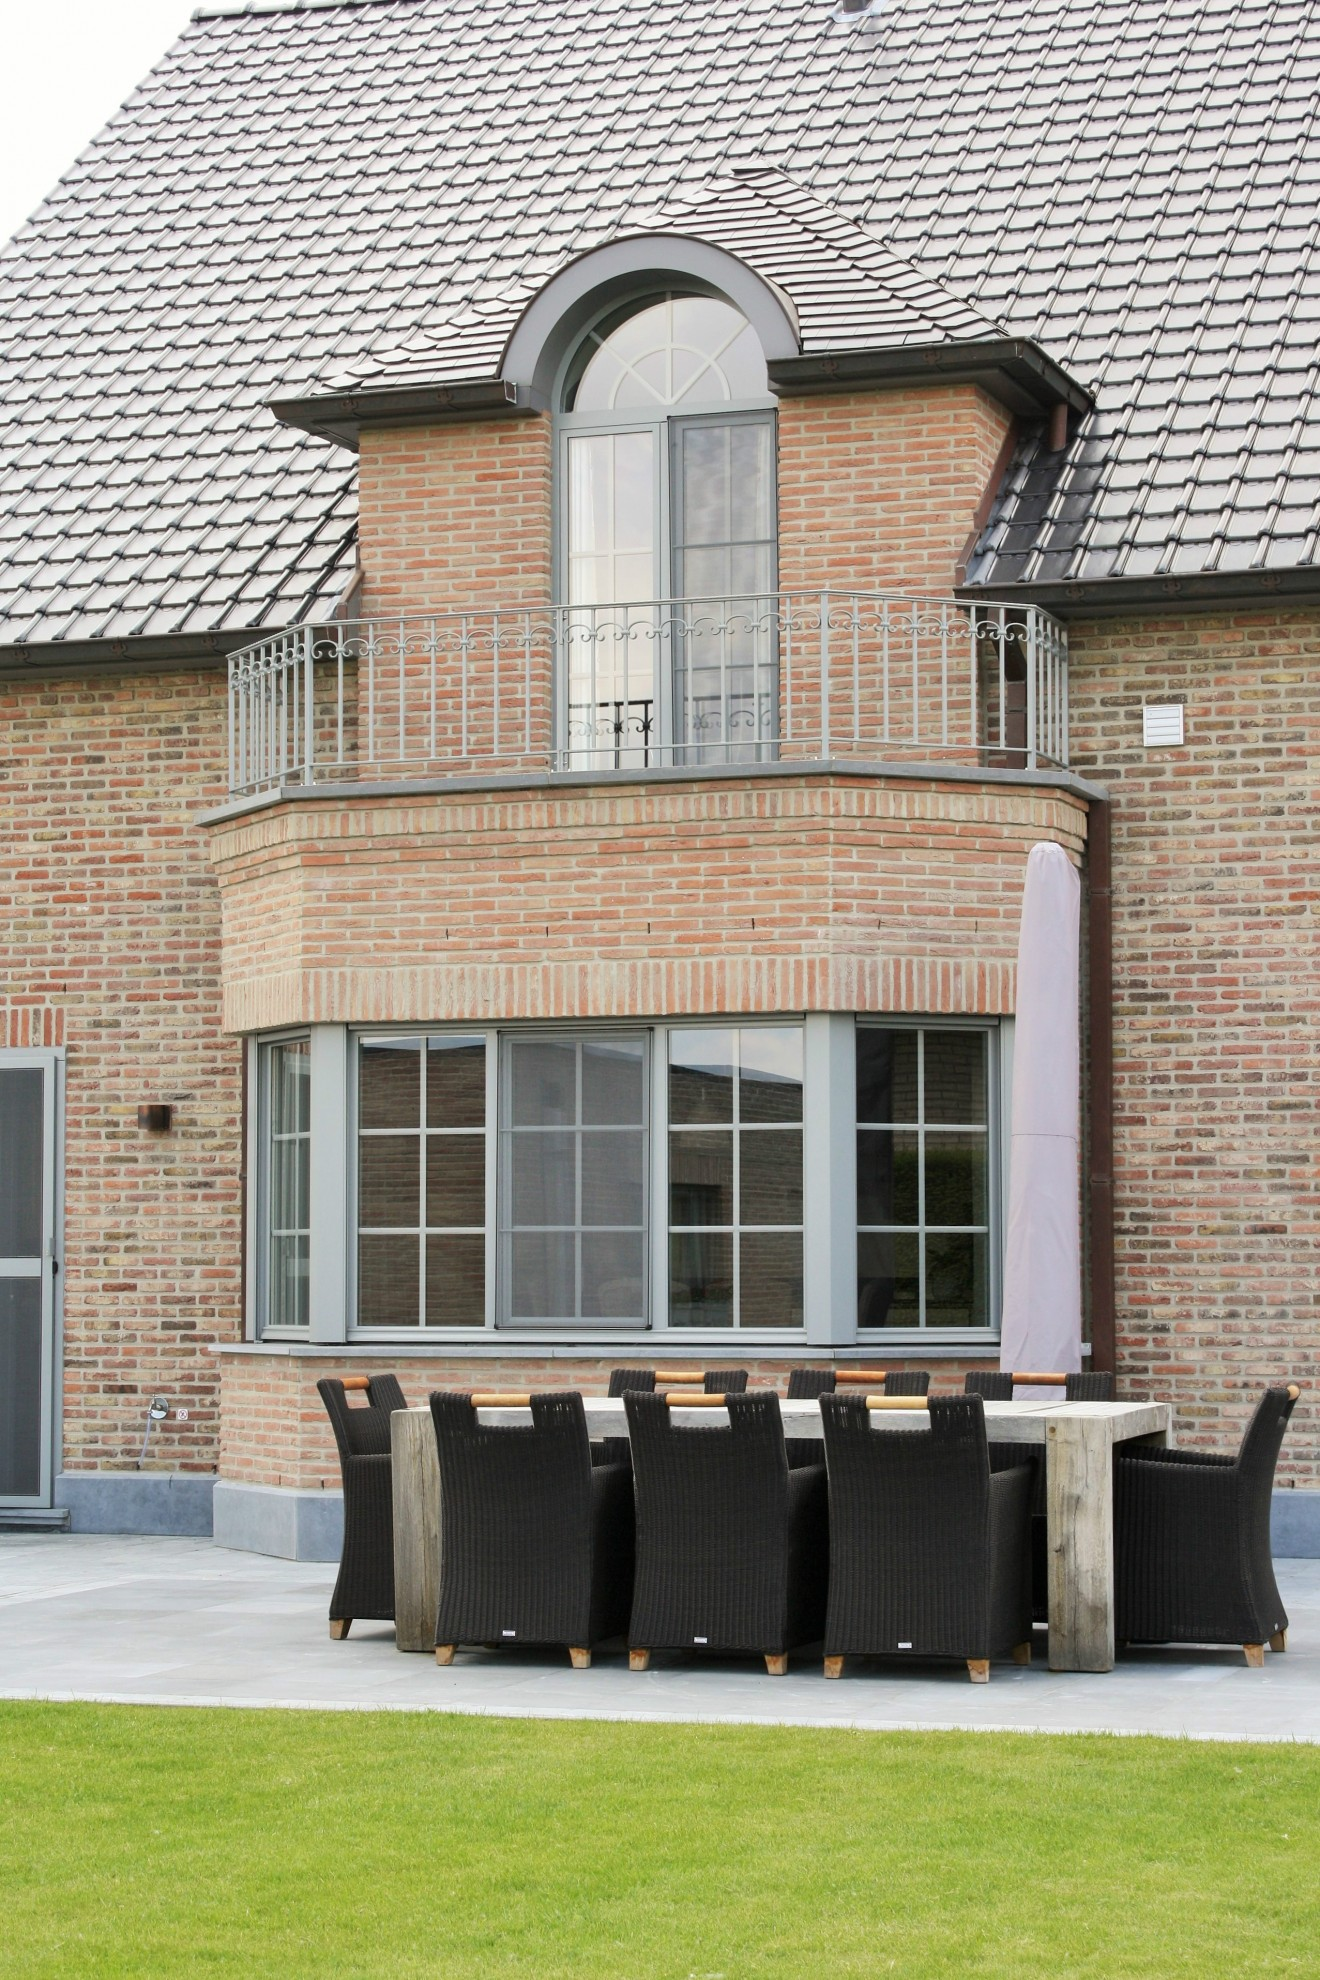 Architect- en ingenieursbureau Andries & Vuylsteke - Nieuwbouwwoning Burst